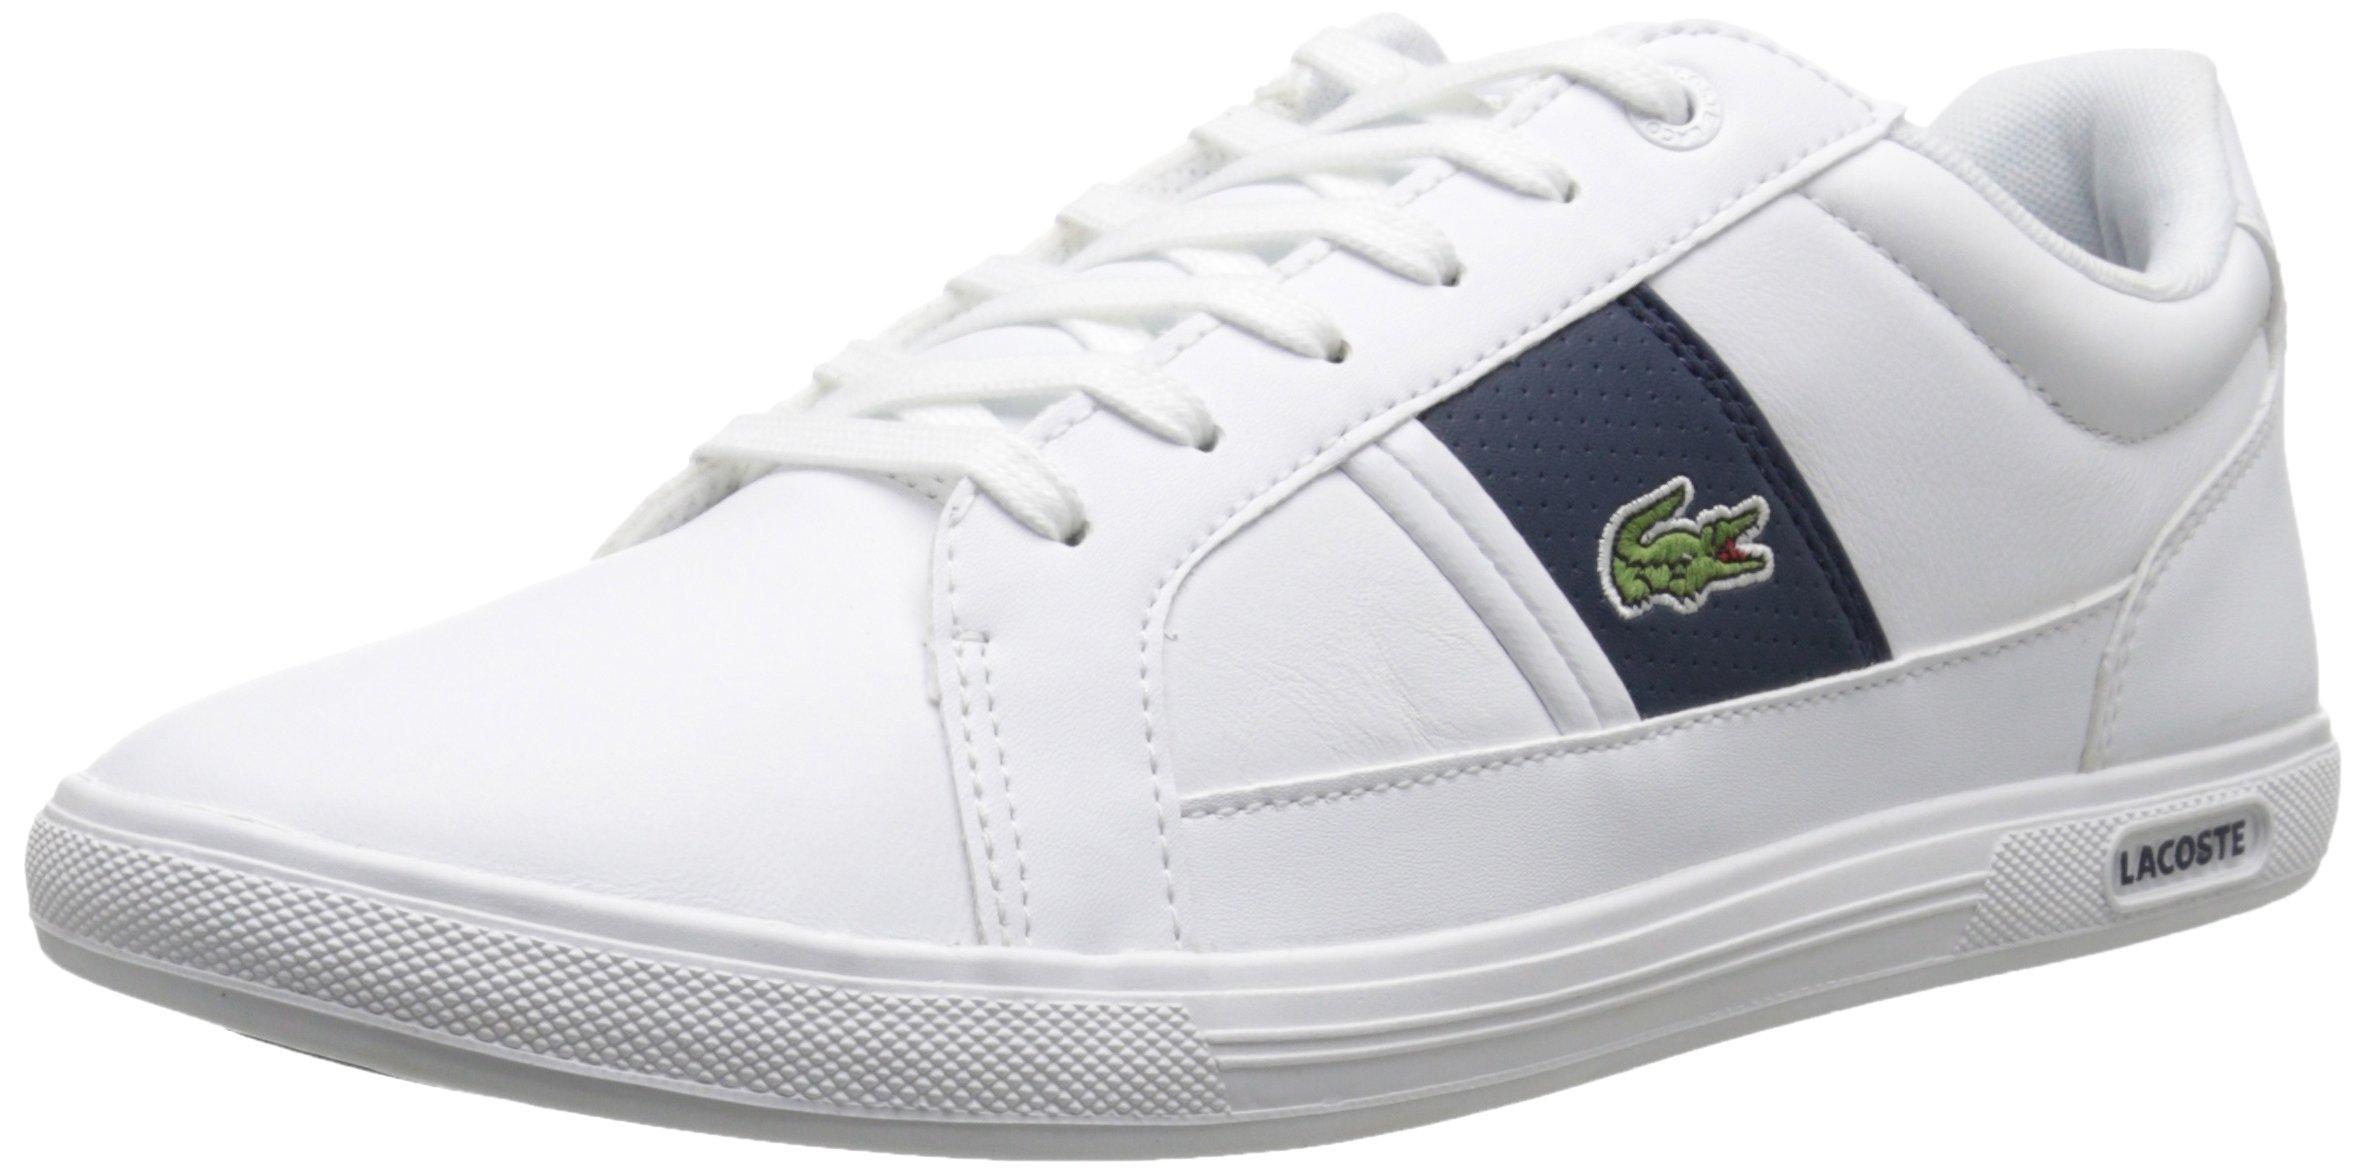 Lacoste Men's Europa Lcr3 SPM Fashion Sneaker Fashion Sneaker, White/Dark Blue, 13 M US